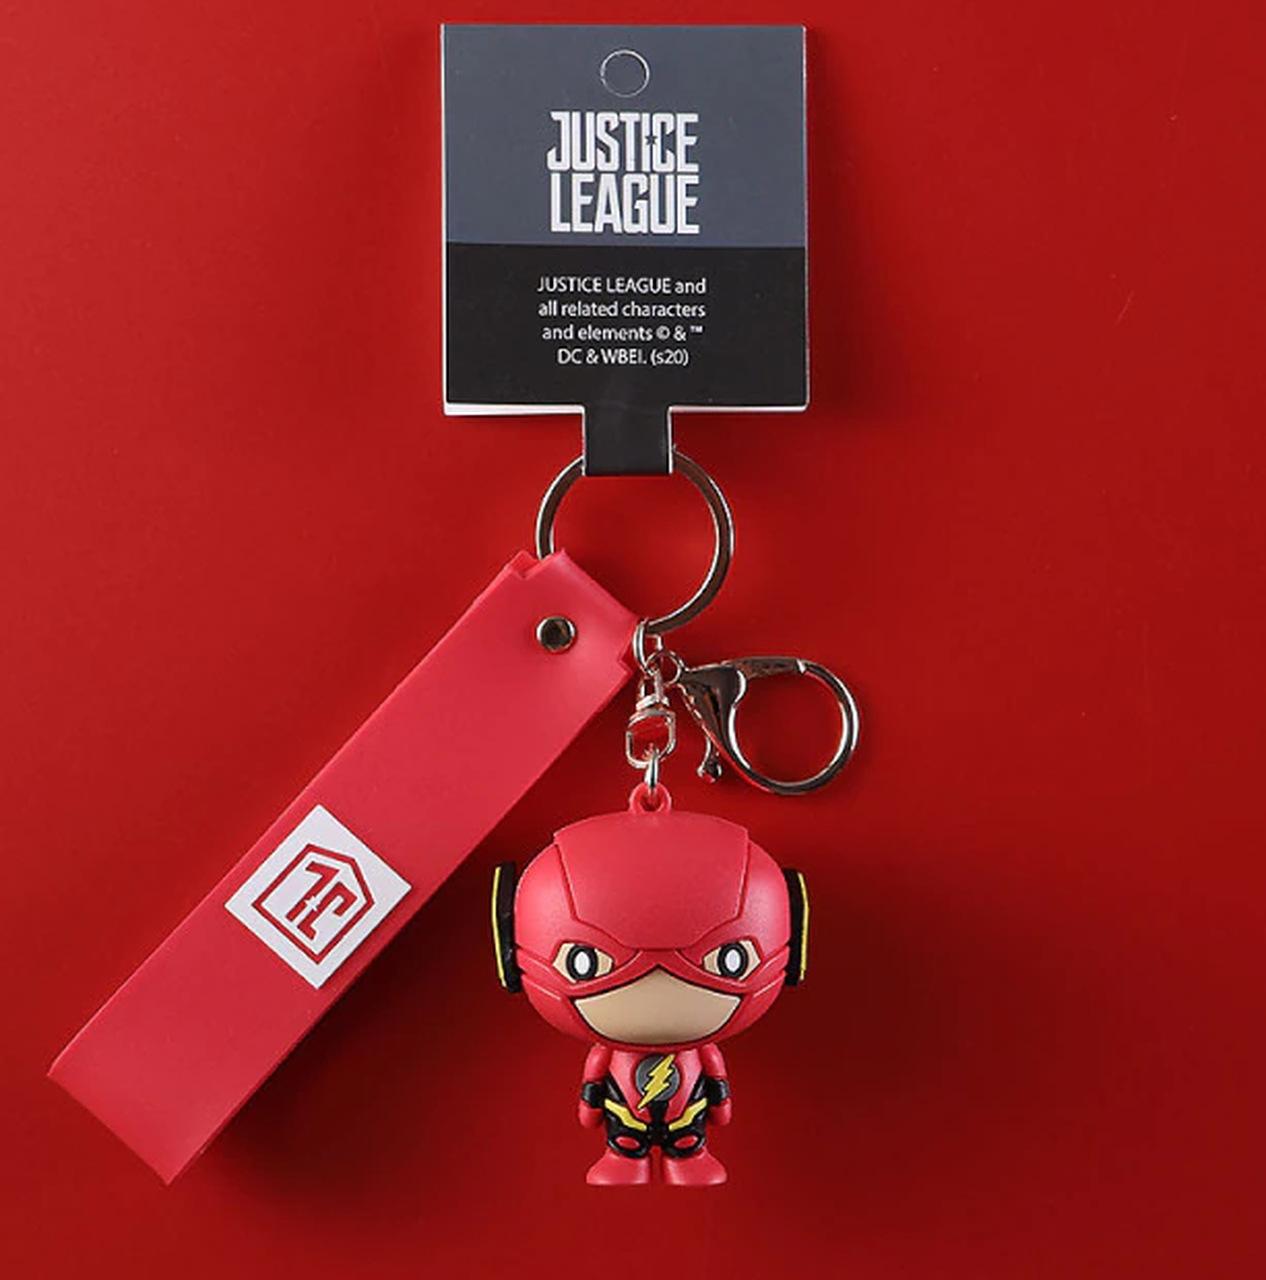 Chaveiro Flash: The Flash Liga da Justiça Justice League DC Comics - EVALI